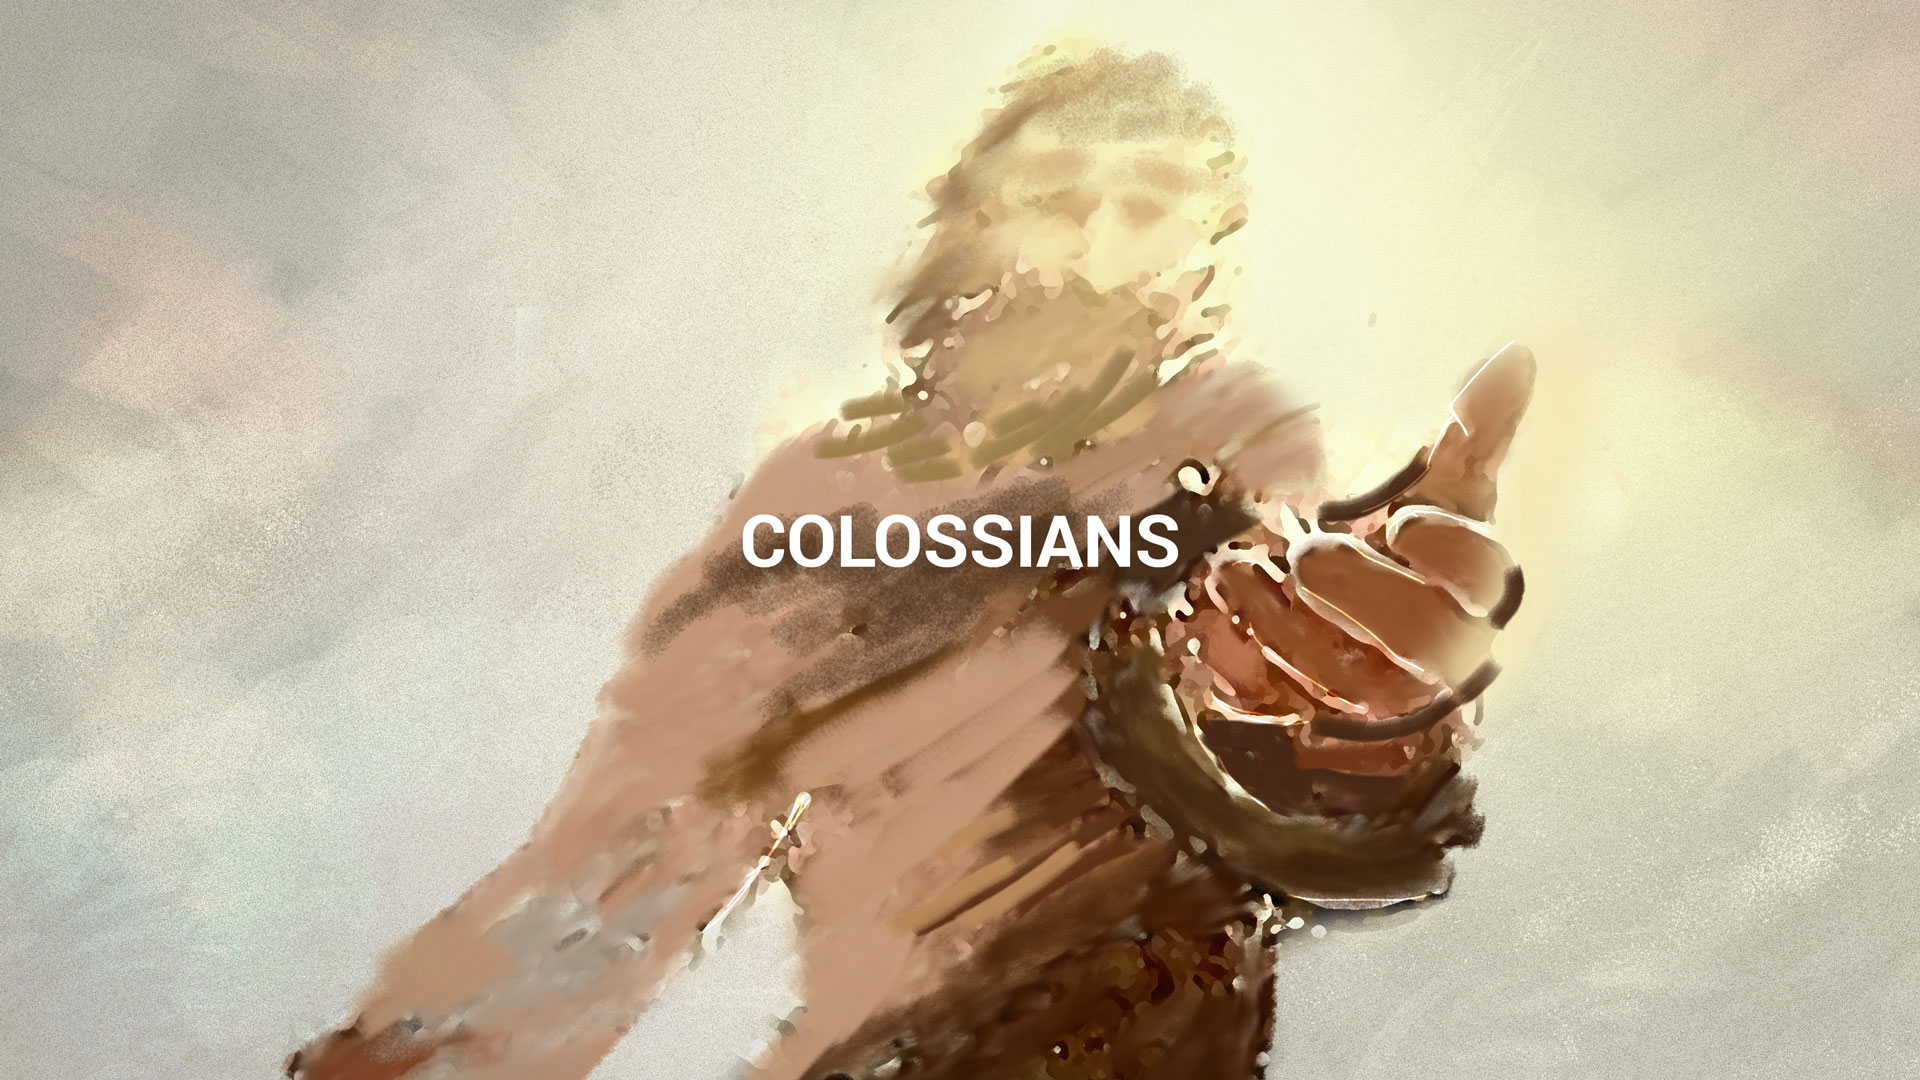 colossians_1_main.jpg